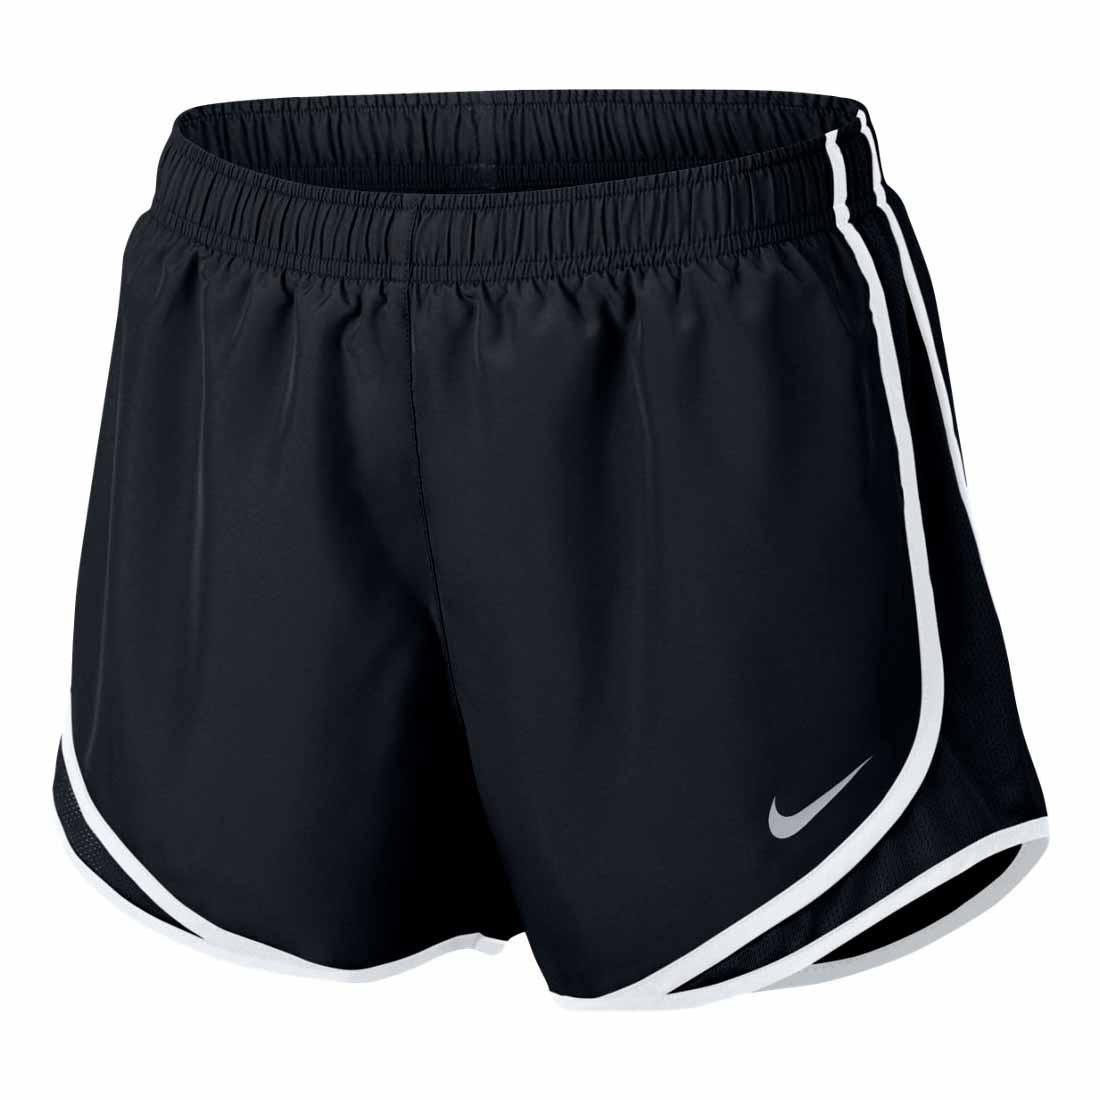 Women's Black/White Nike Tempo Running Shorts